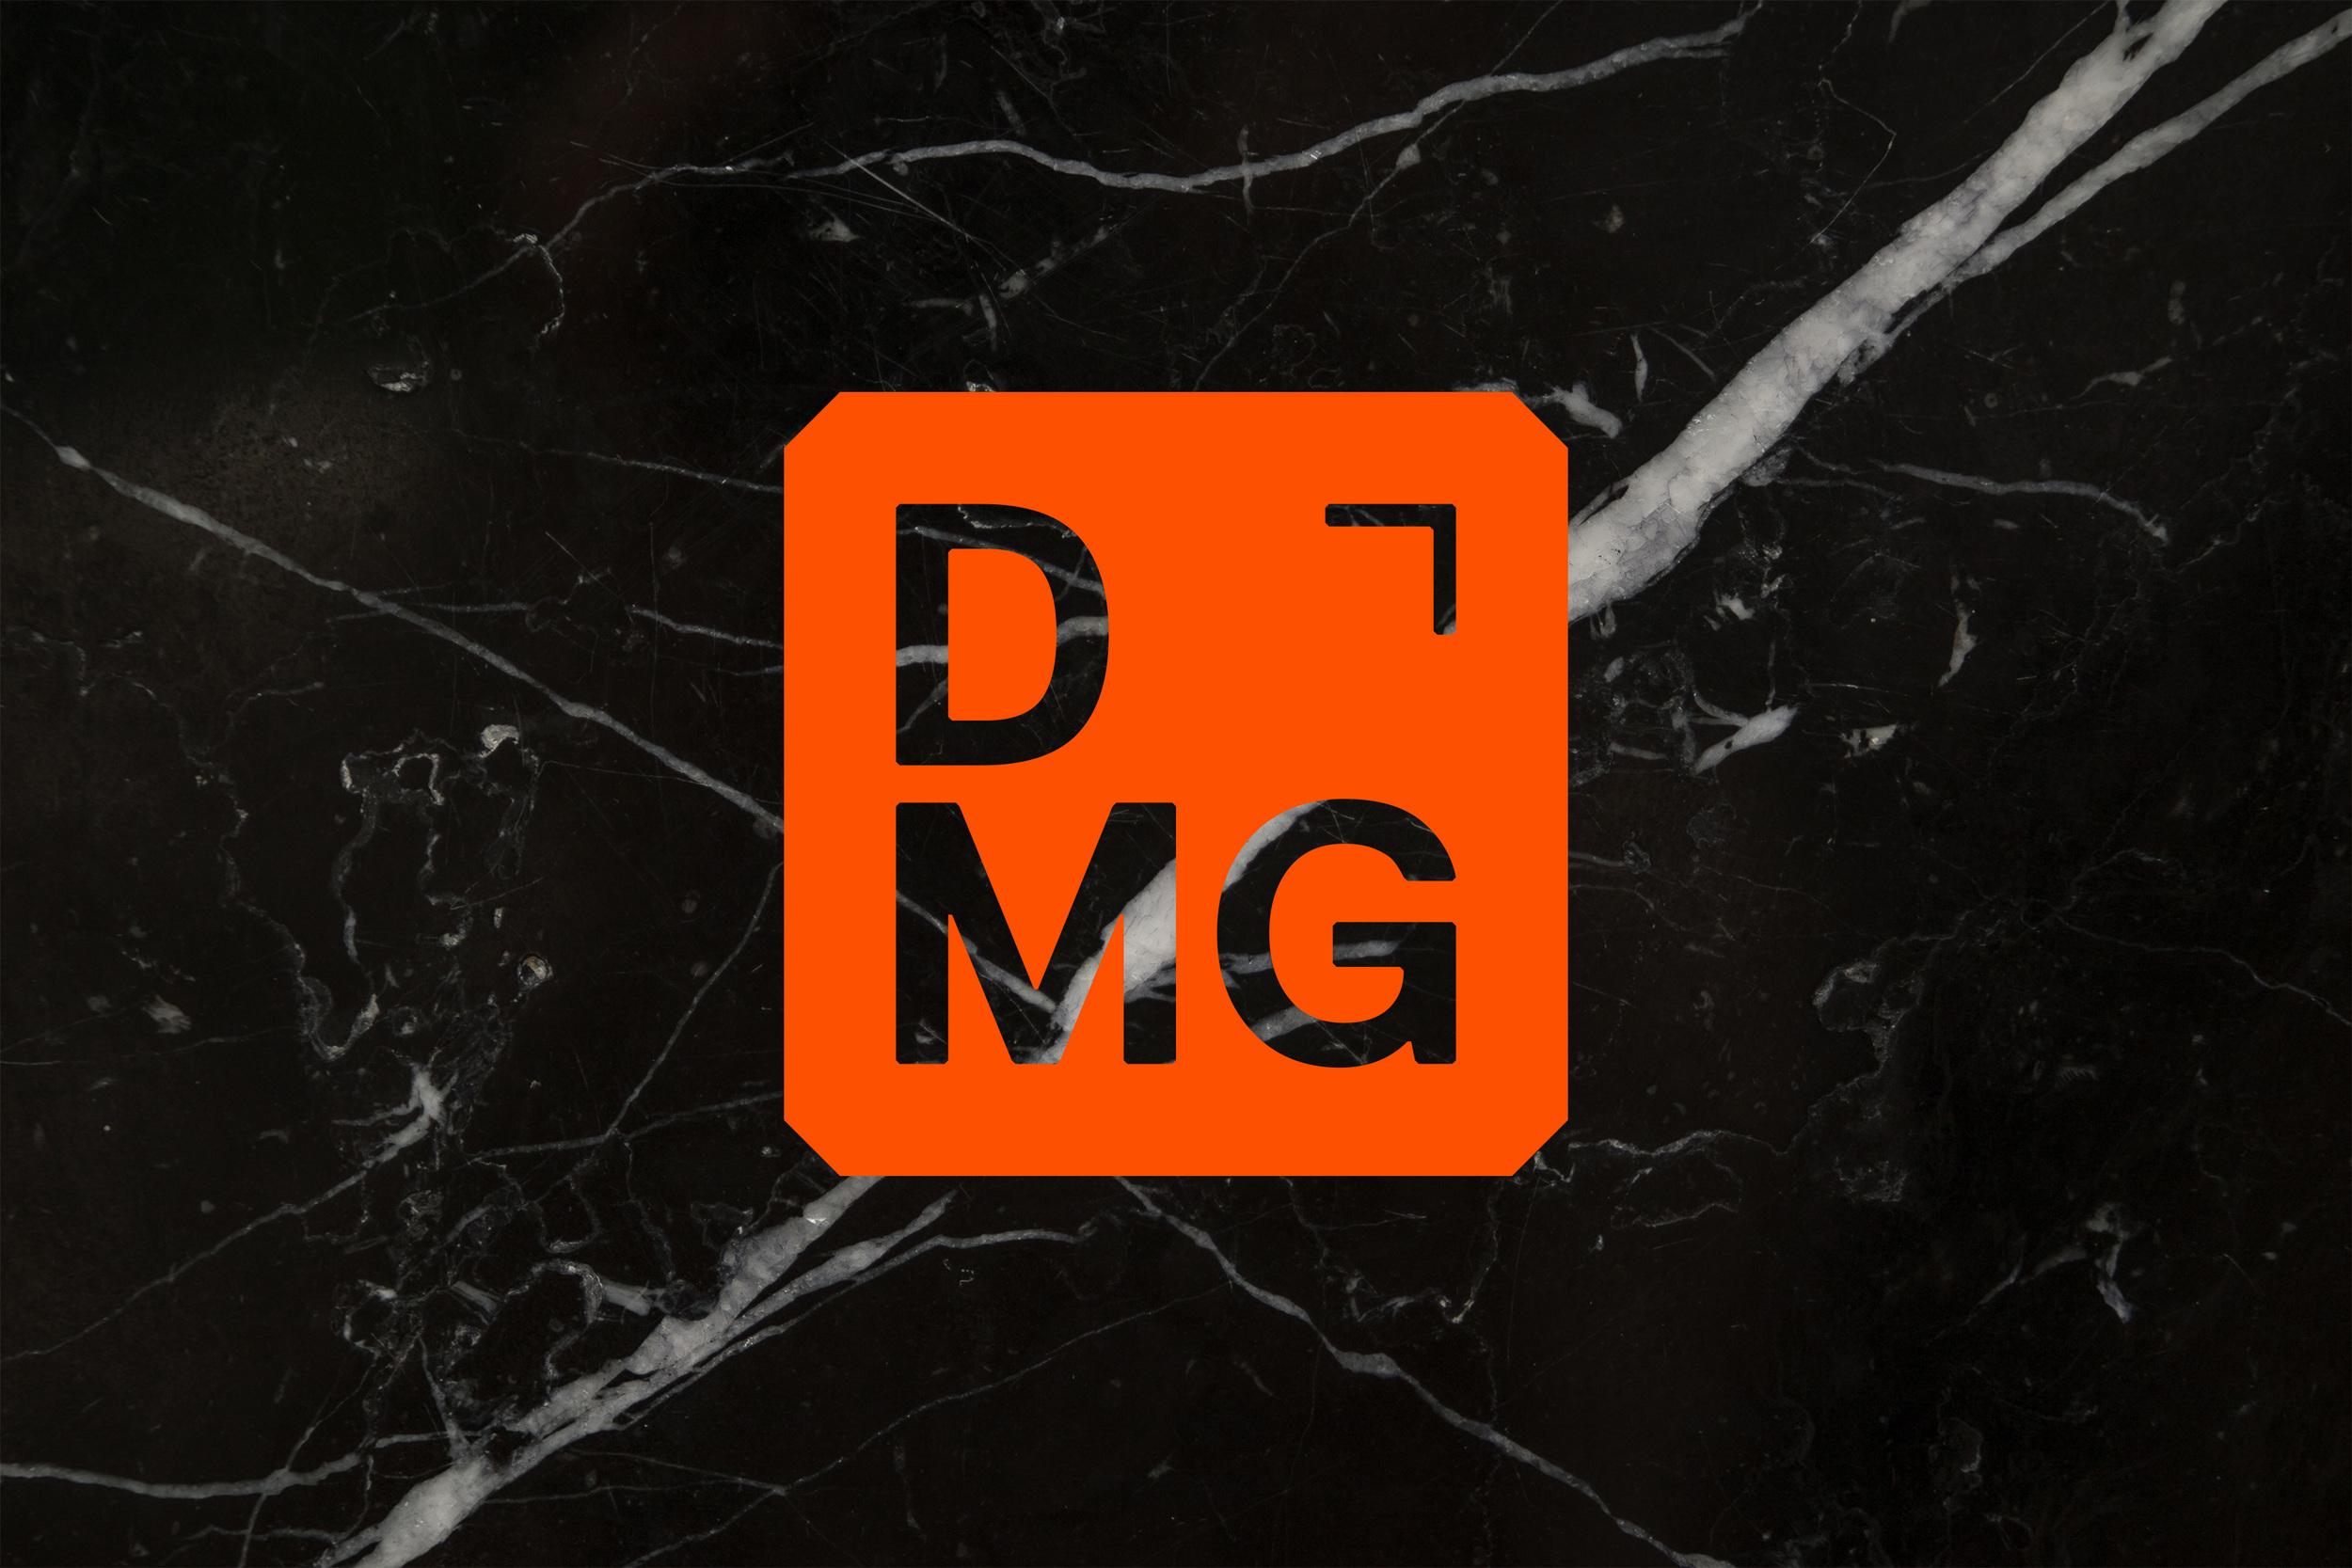 DMG_symbol-bg.jpg